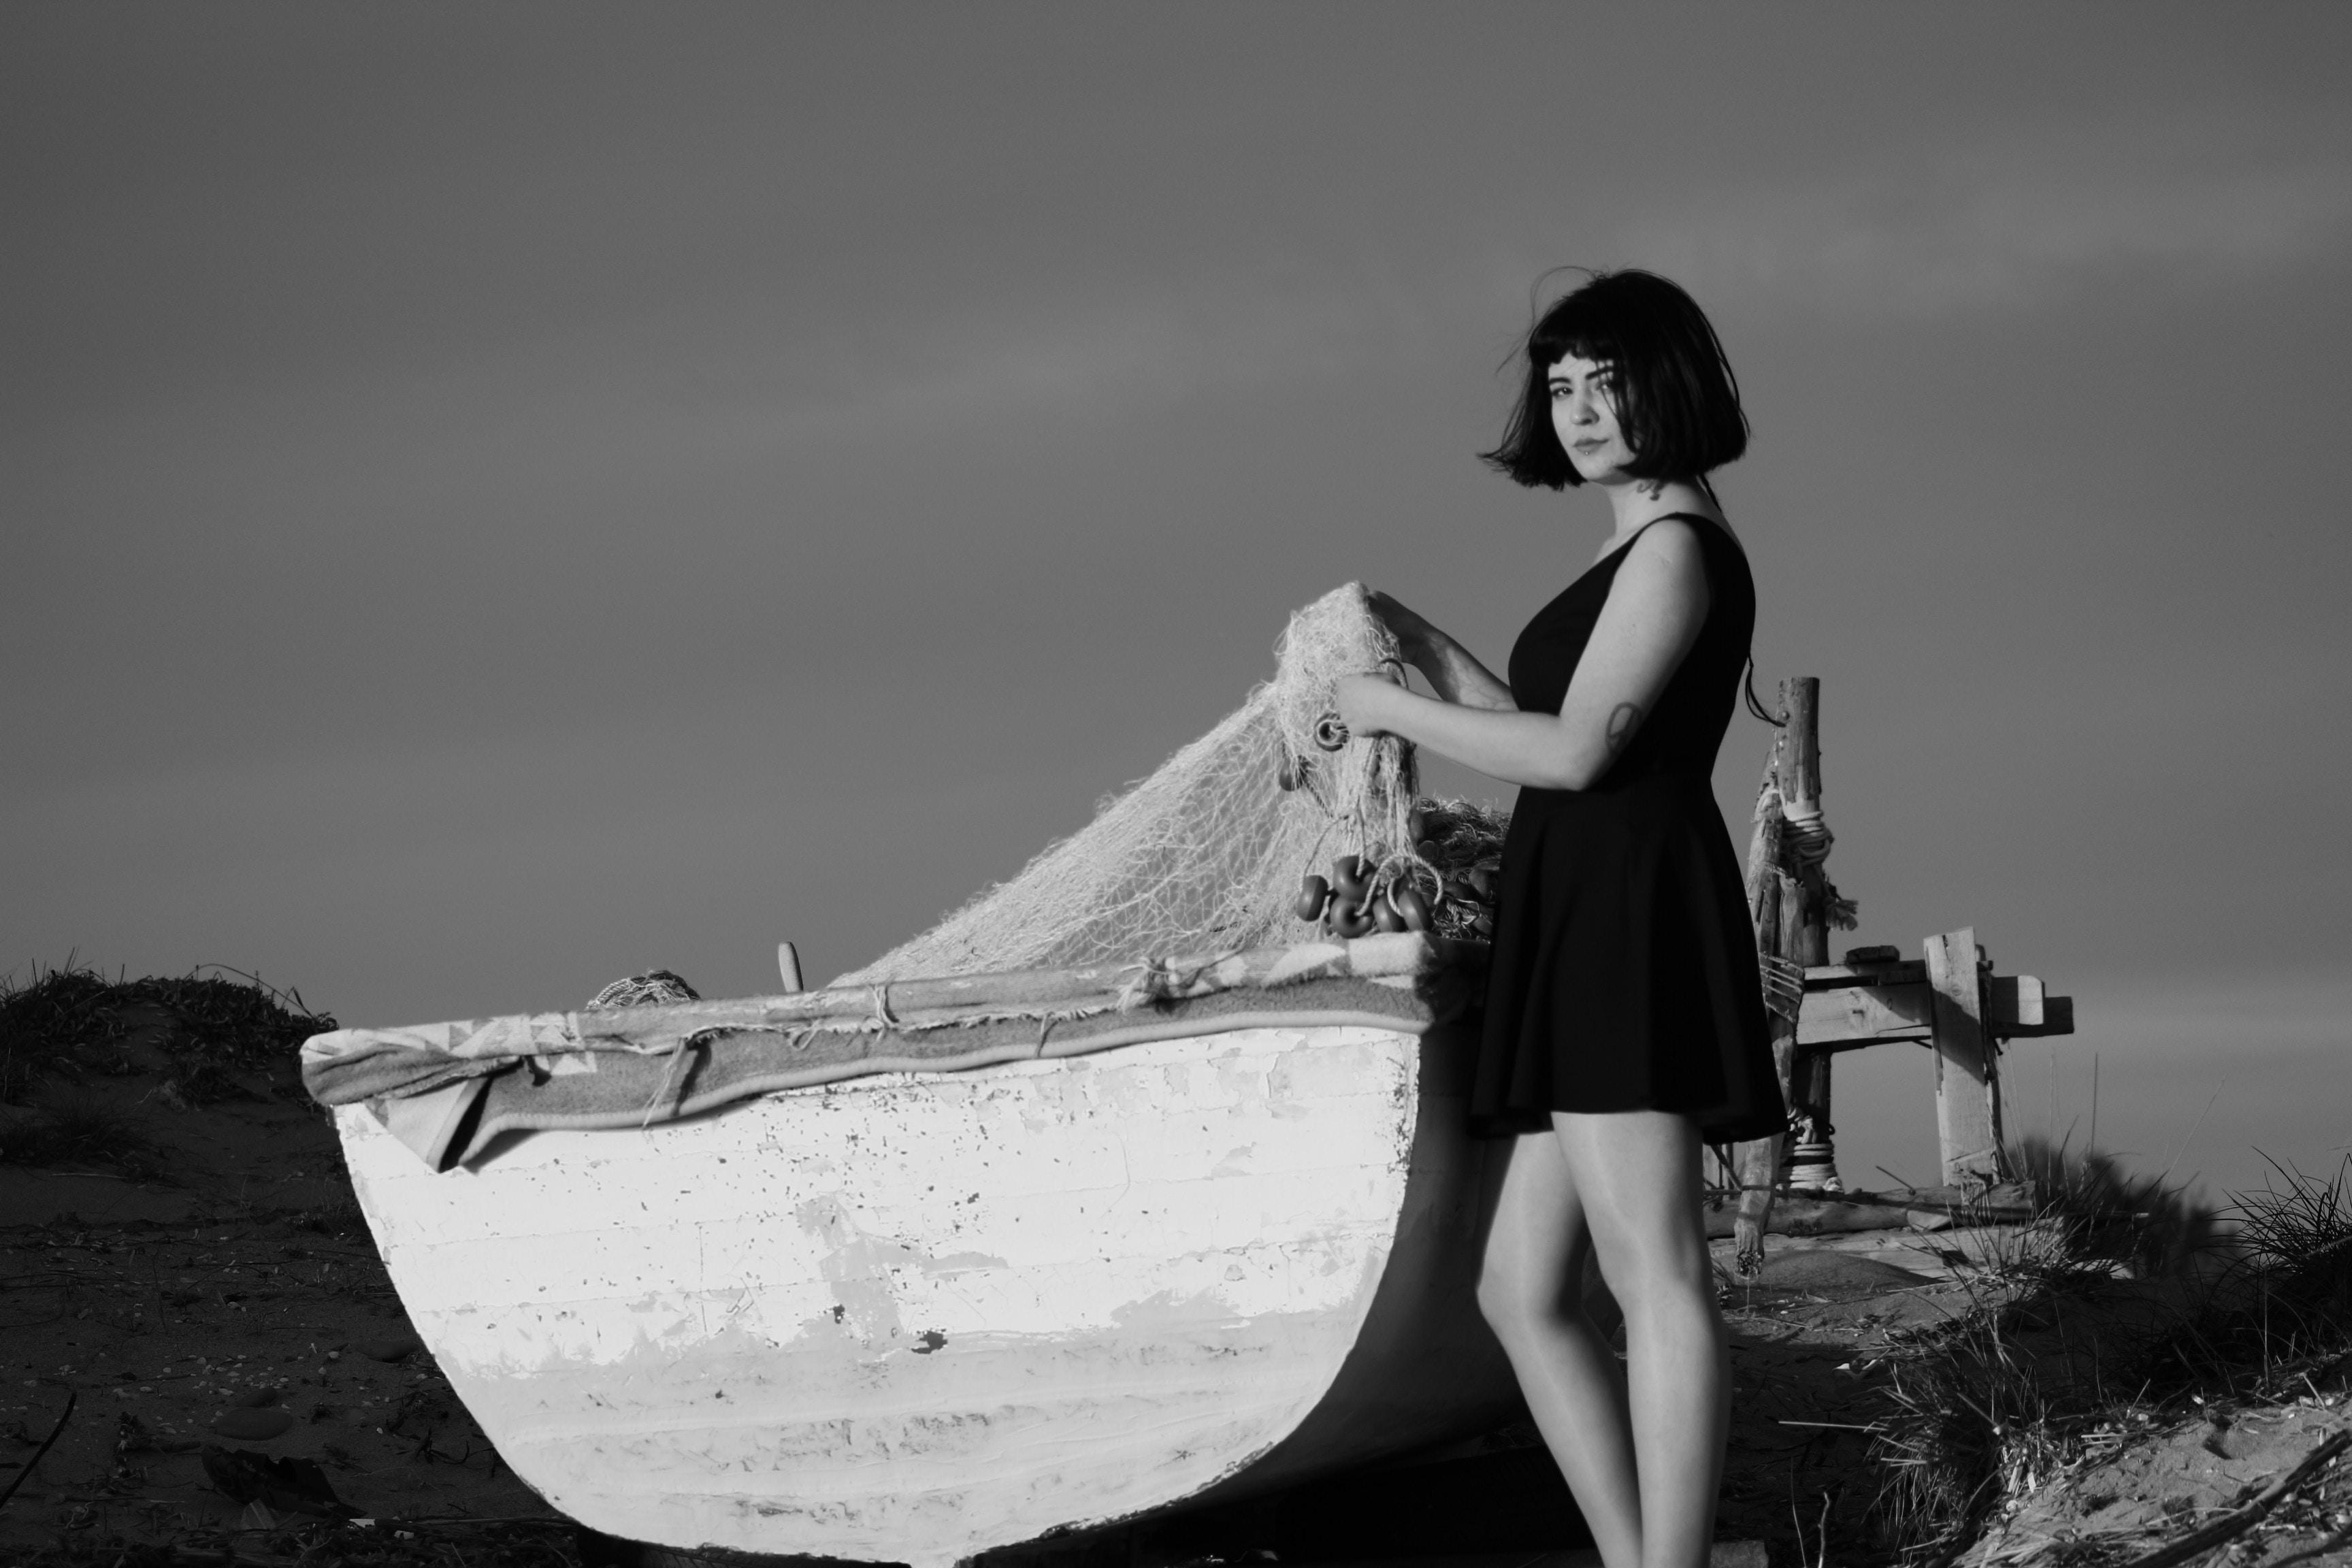 grayscale photo of woman holding fish net